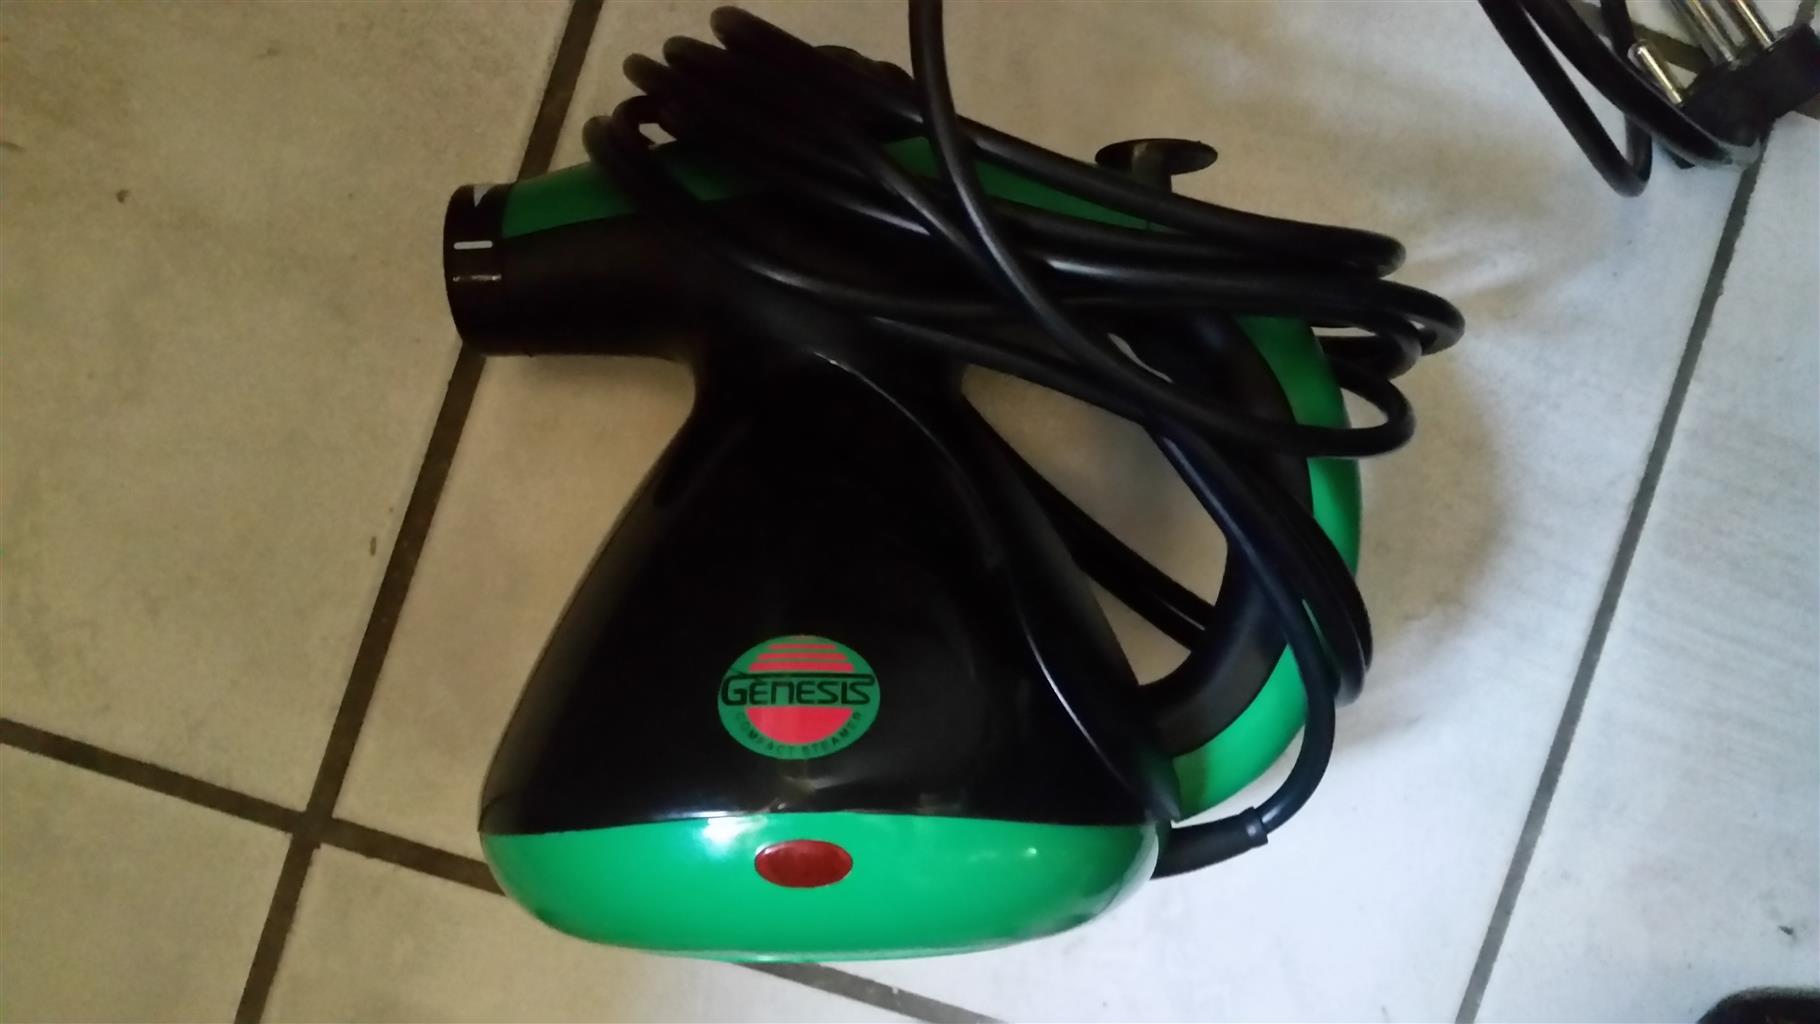 Genesis Steam Cleaner for Sale